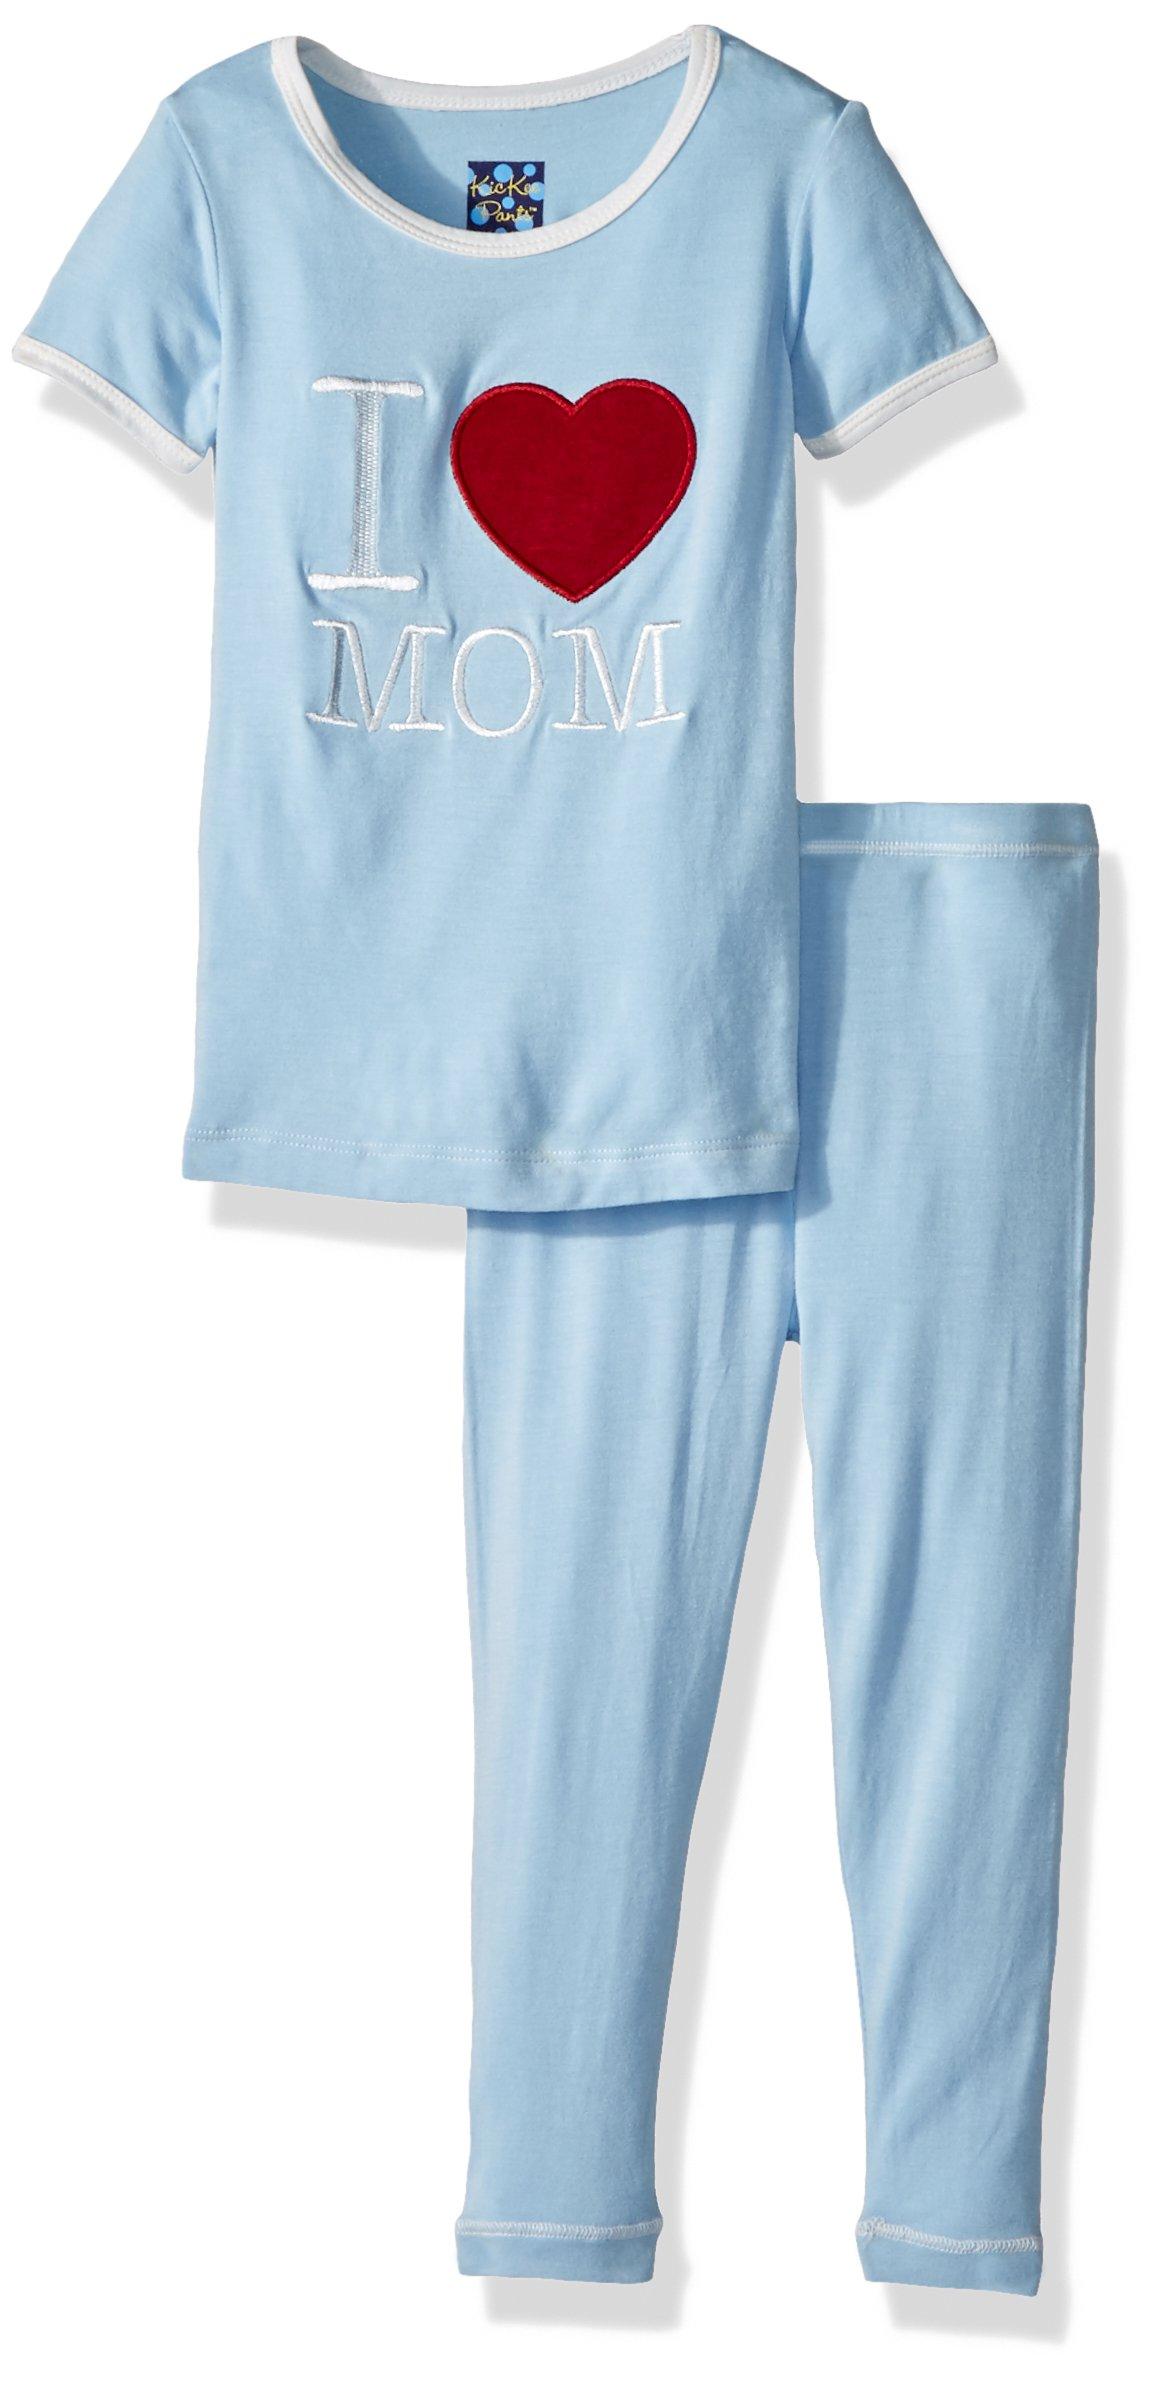 Kickee Pants Toddler Boys' Holiday Short Sleeve Applique Pajama Set, Pond I Love Mom, 4T